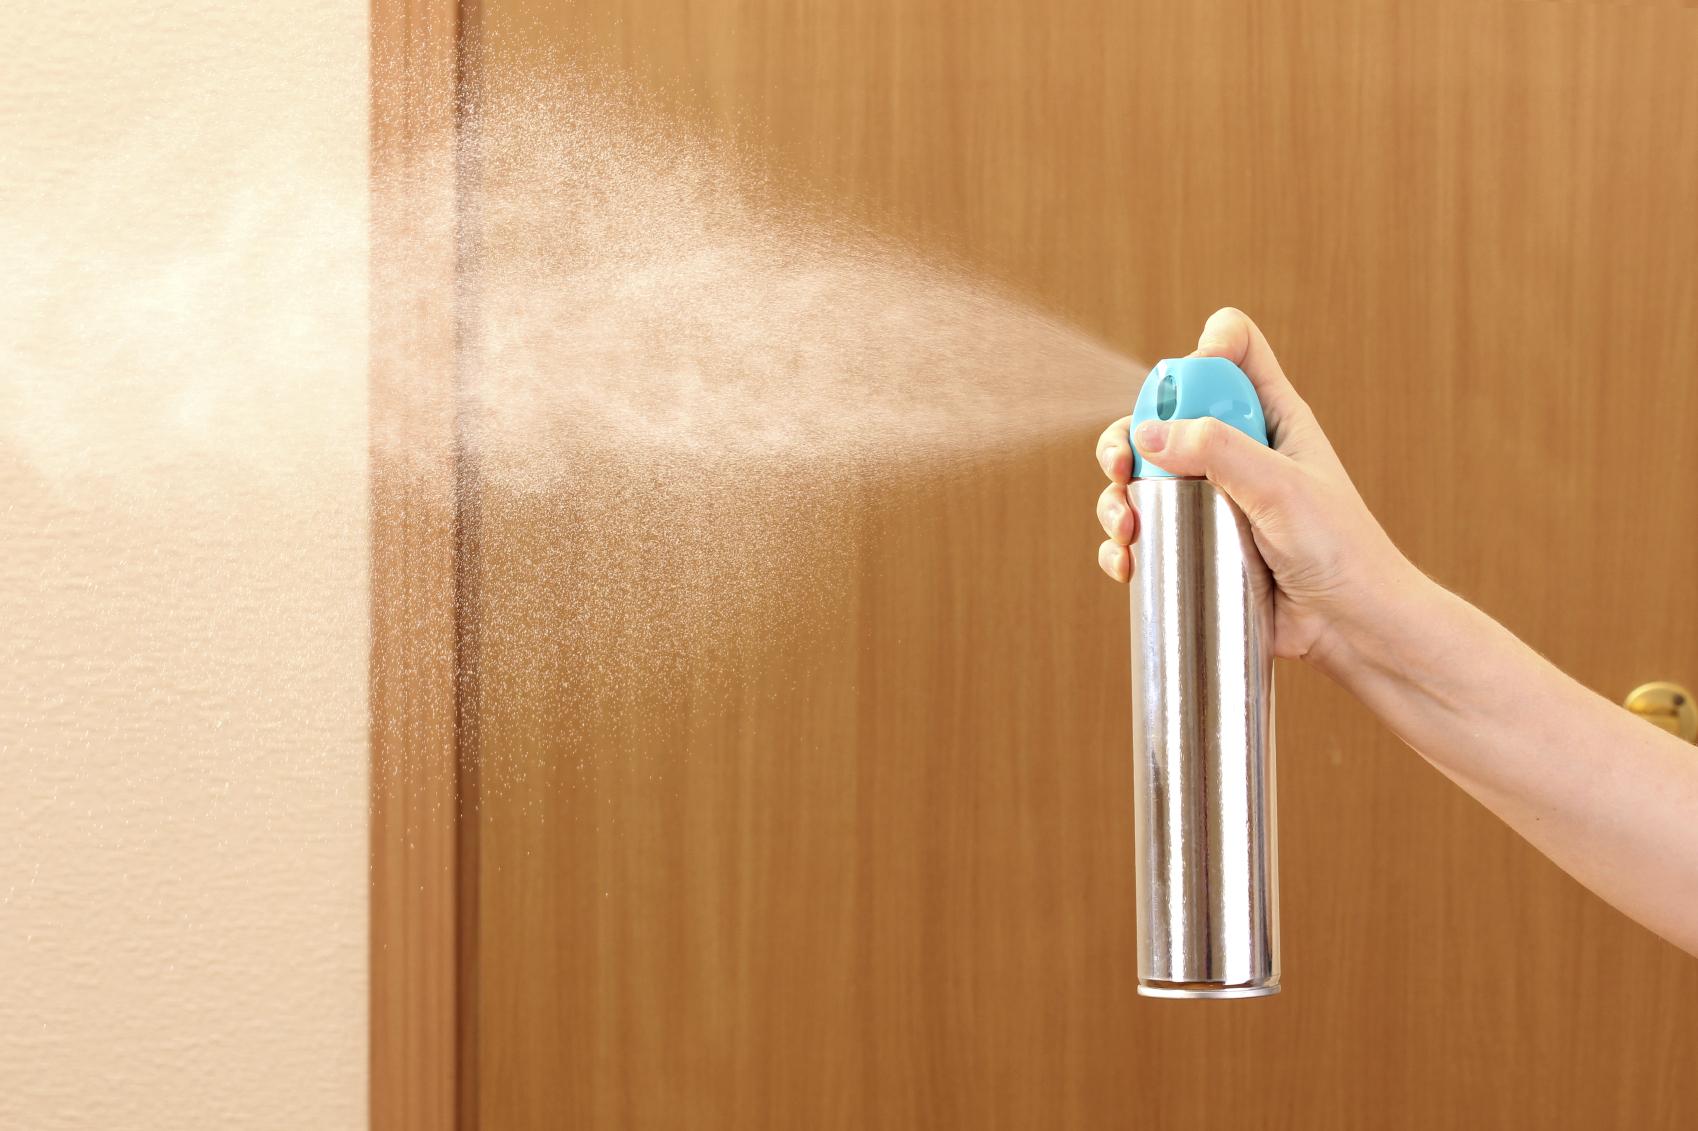 Sprayed air freshener in hand on room background